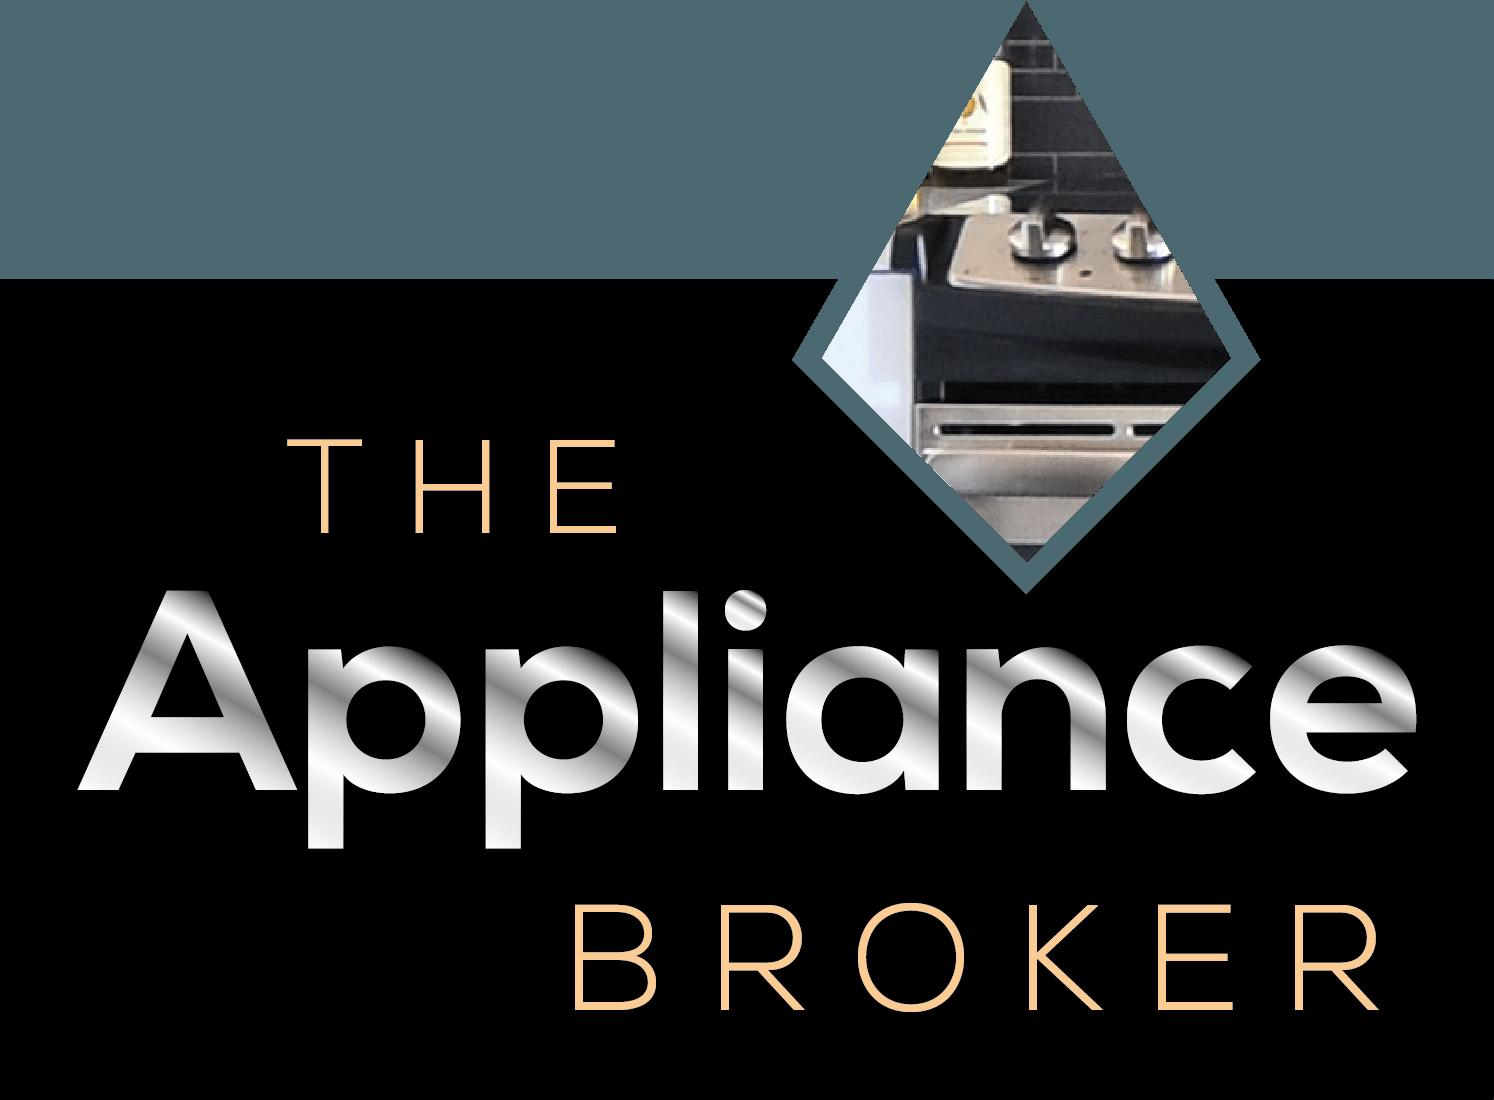 The Appliances Broker